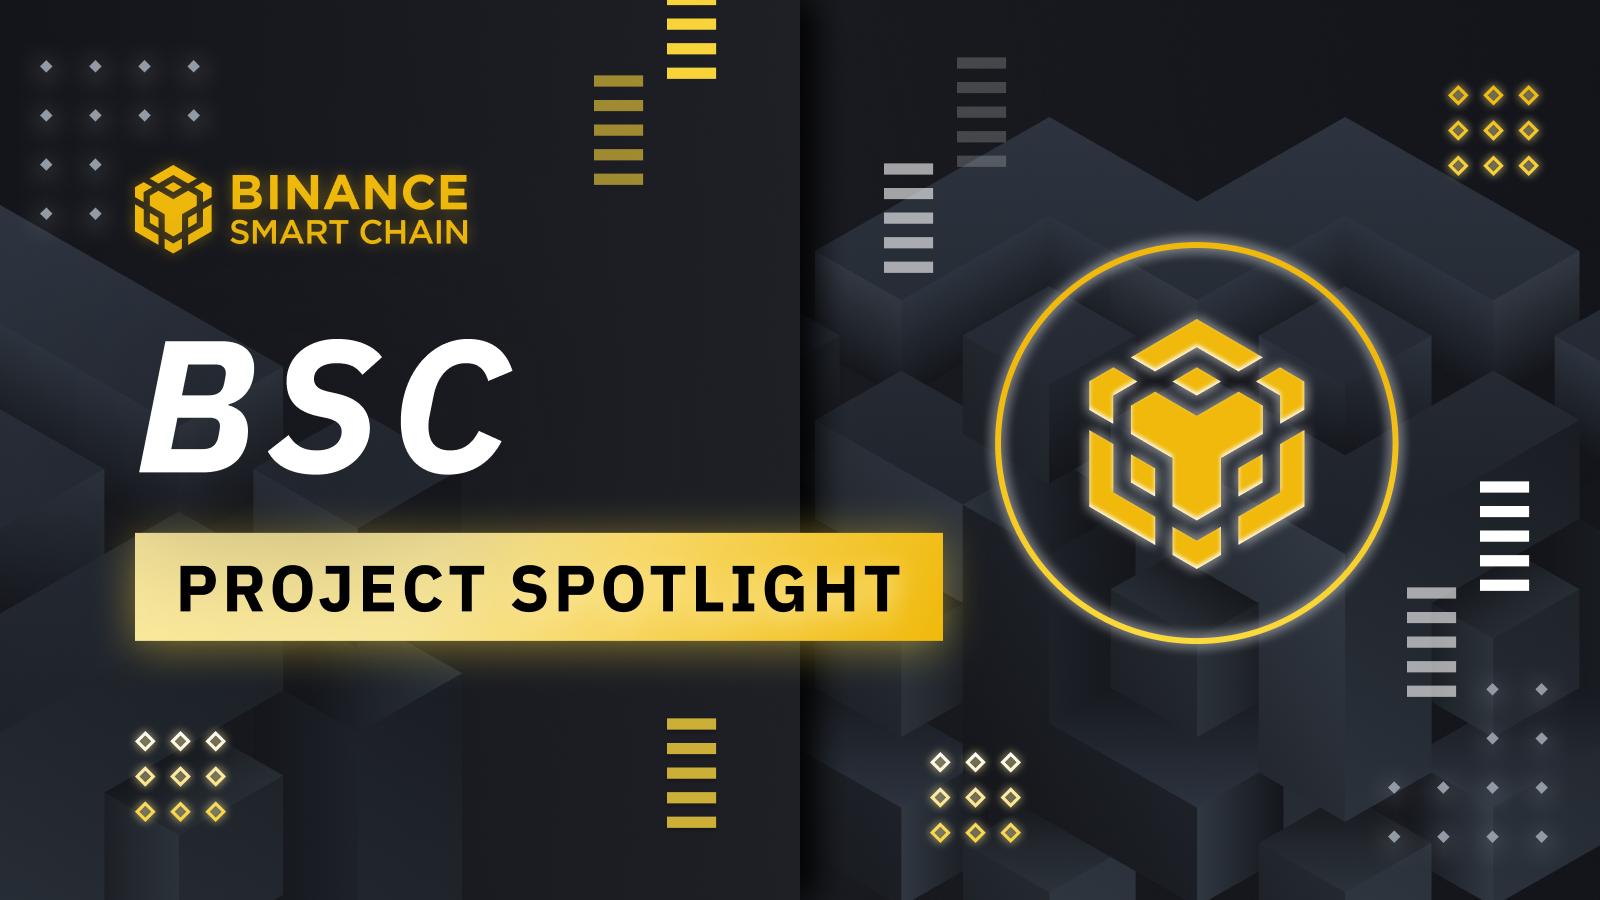 BSC Project Spotlight: Ampleforth